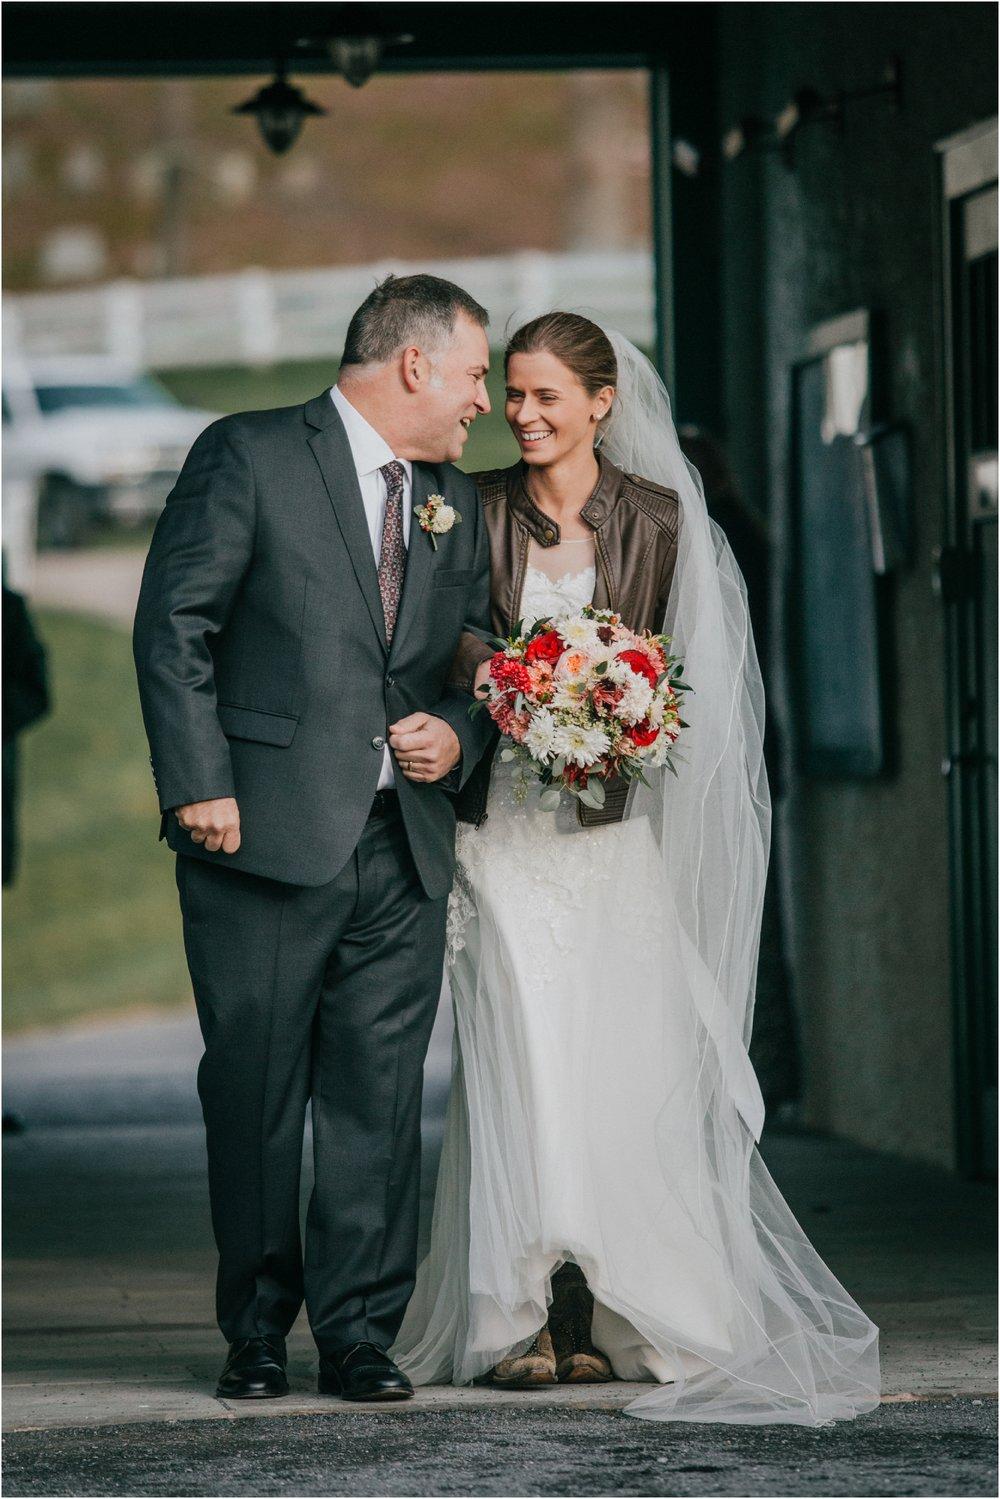 warm-springs-old-dairy-virginia-rustic-wedding-northeast-tennessee-elopement-adventuruous-photographer-katy-sergent_0081.jpg